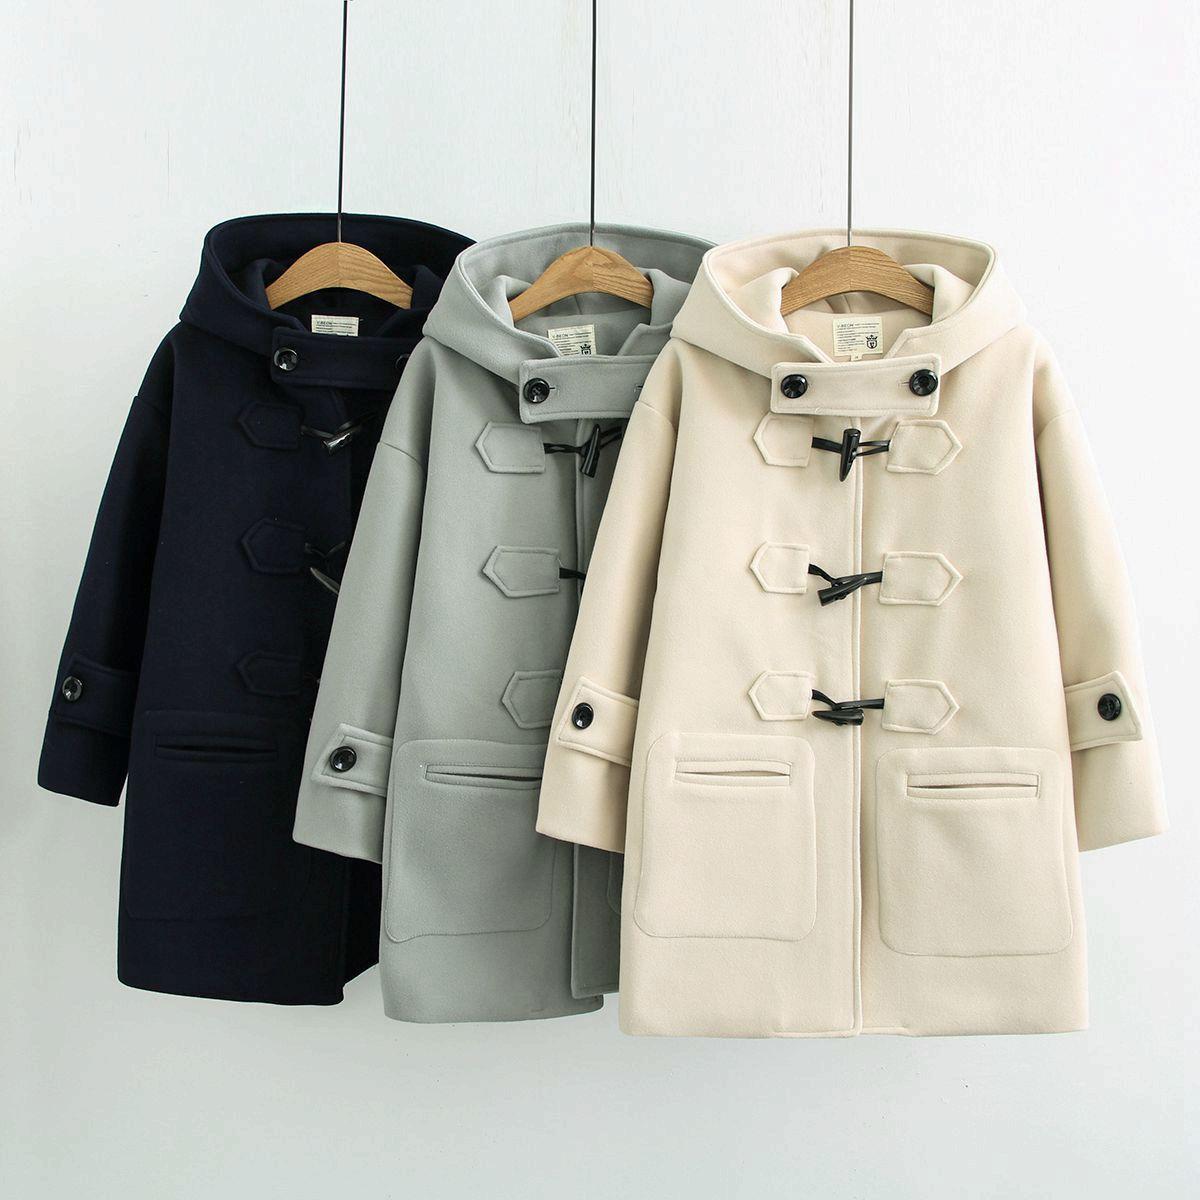 2018 Cow horn buckles coats women autumn and winter  long woolen coat hooded student small coat